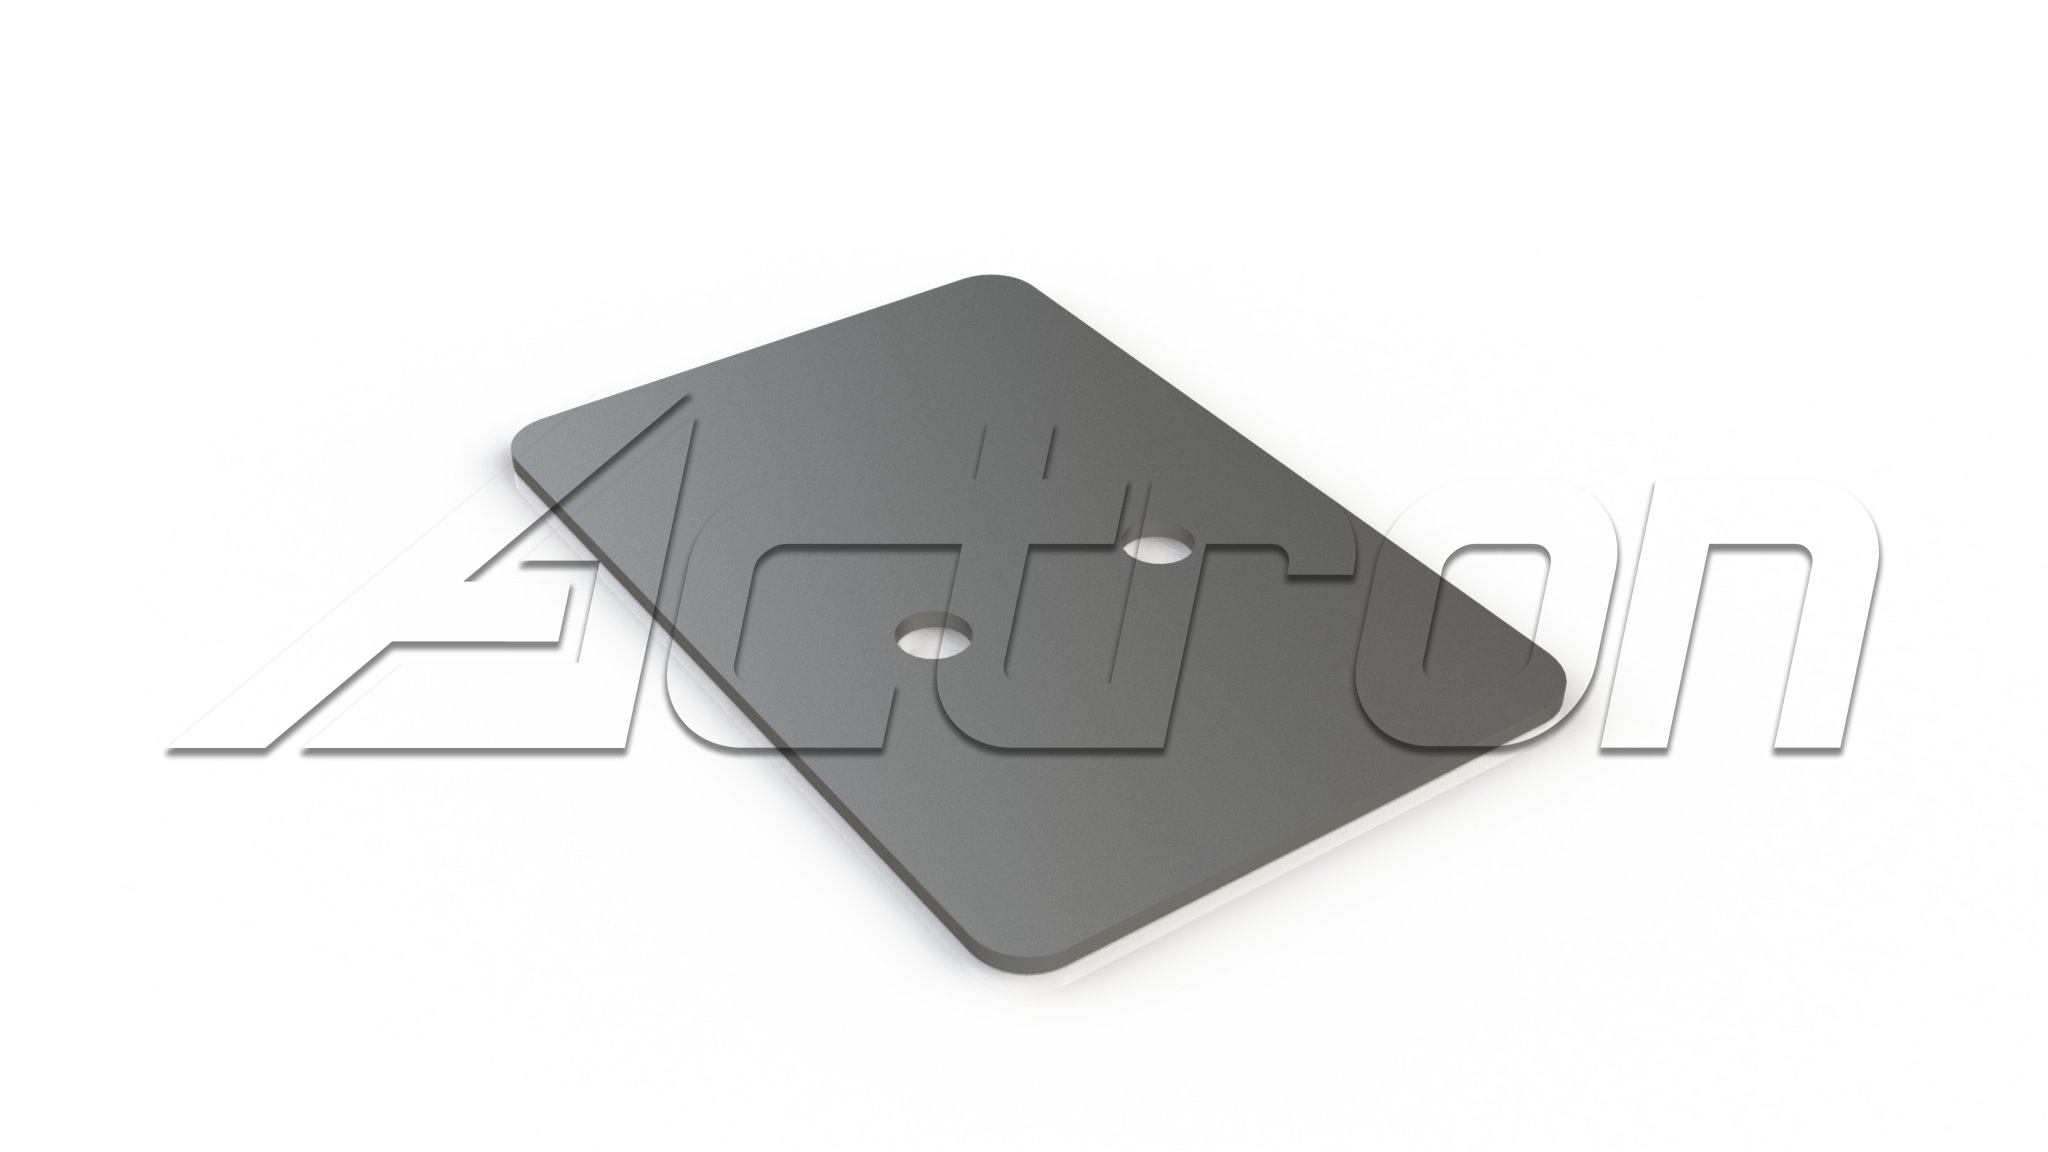 mounting-plate-8211-latch-5260-a43005.jpg